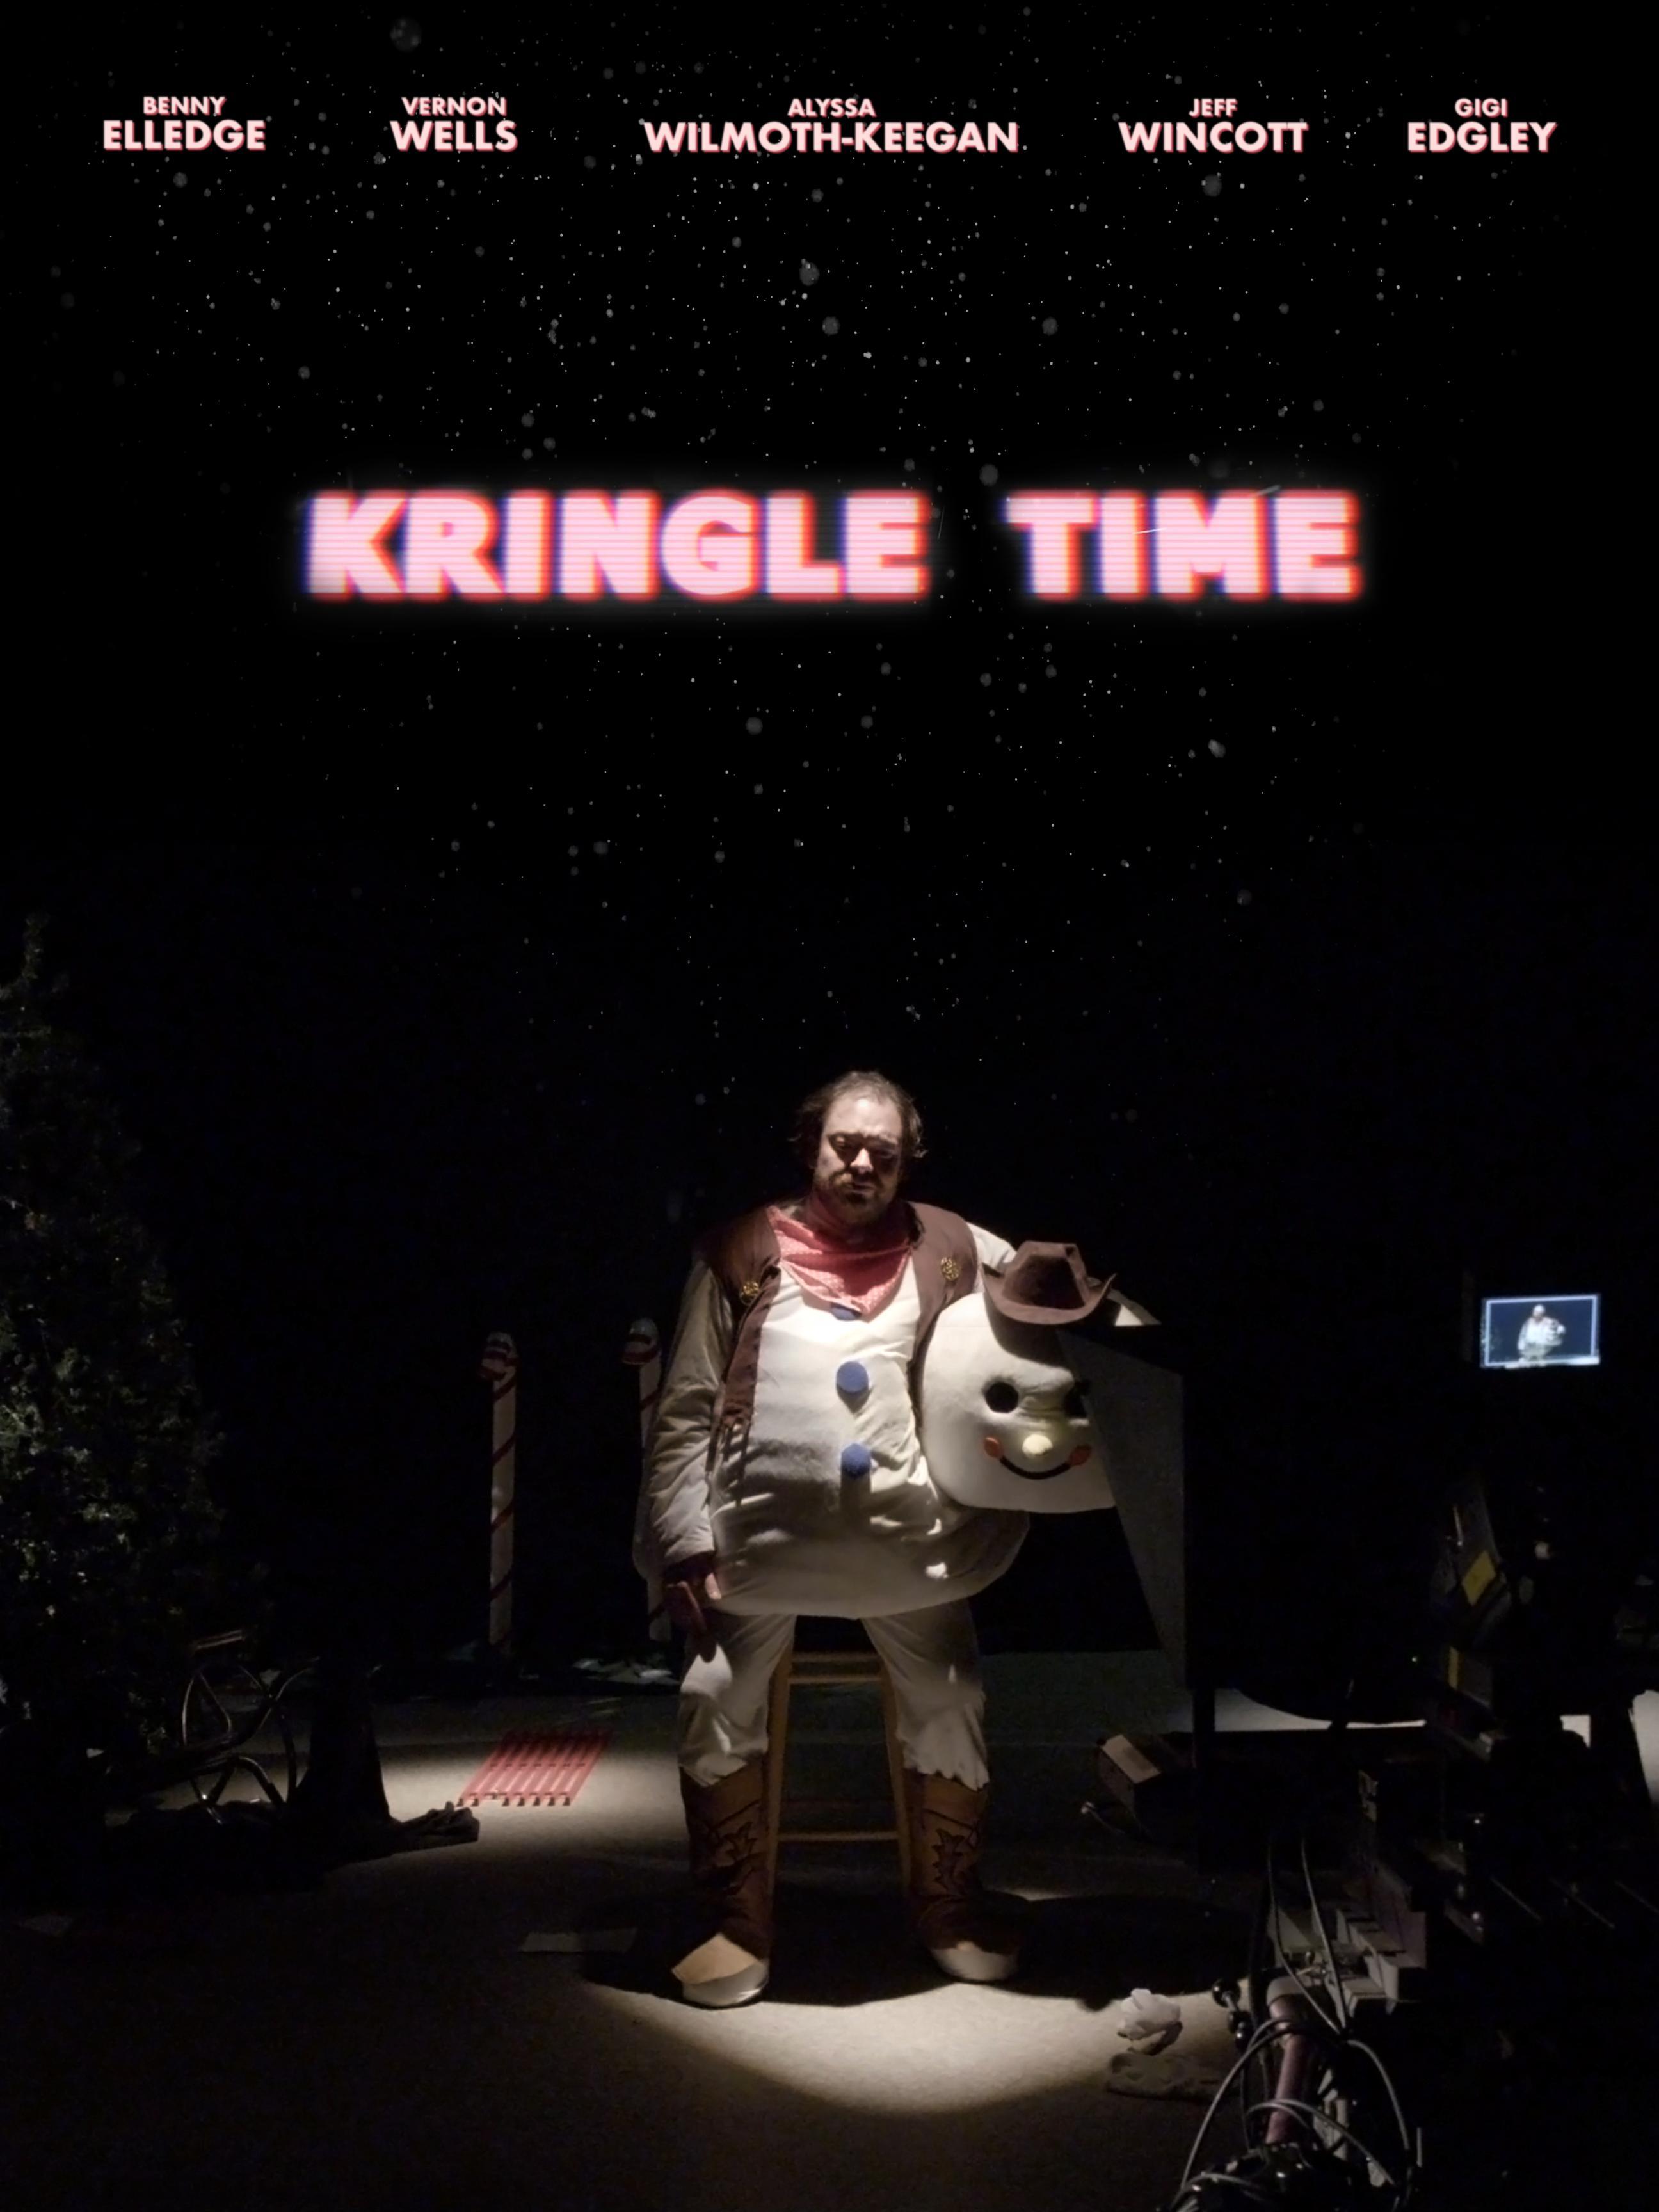 Kringle Time 2021 English 480p HDRip 300MB Download